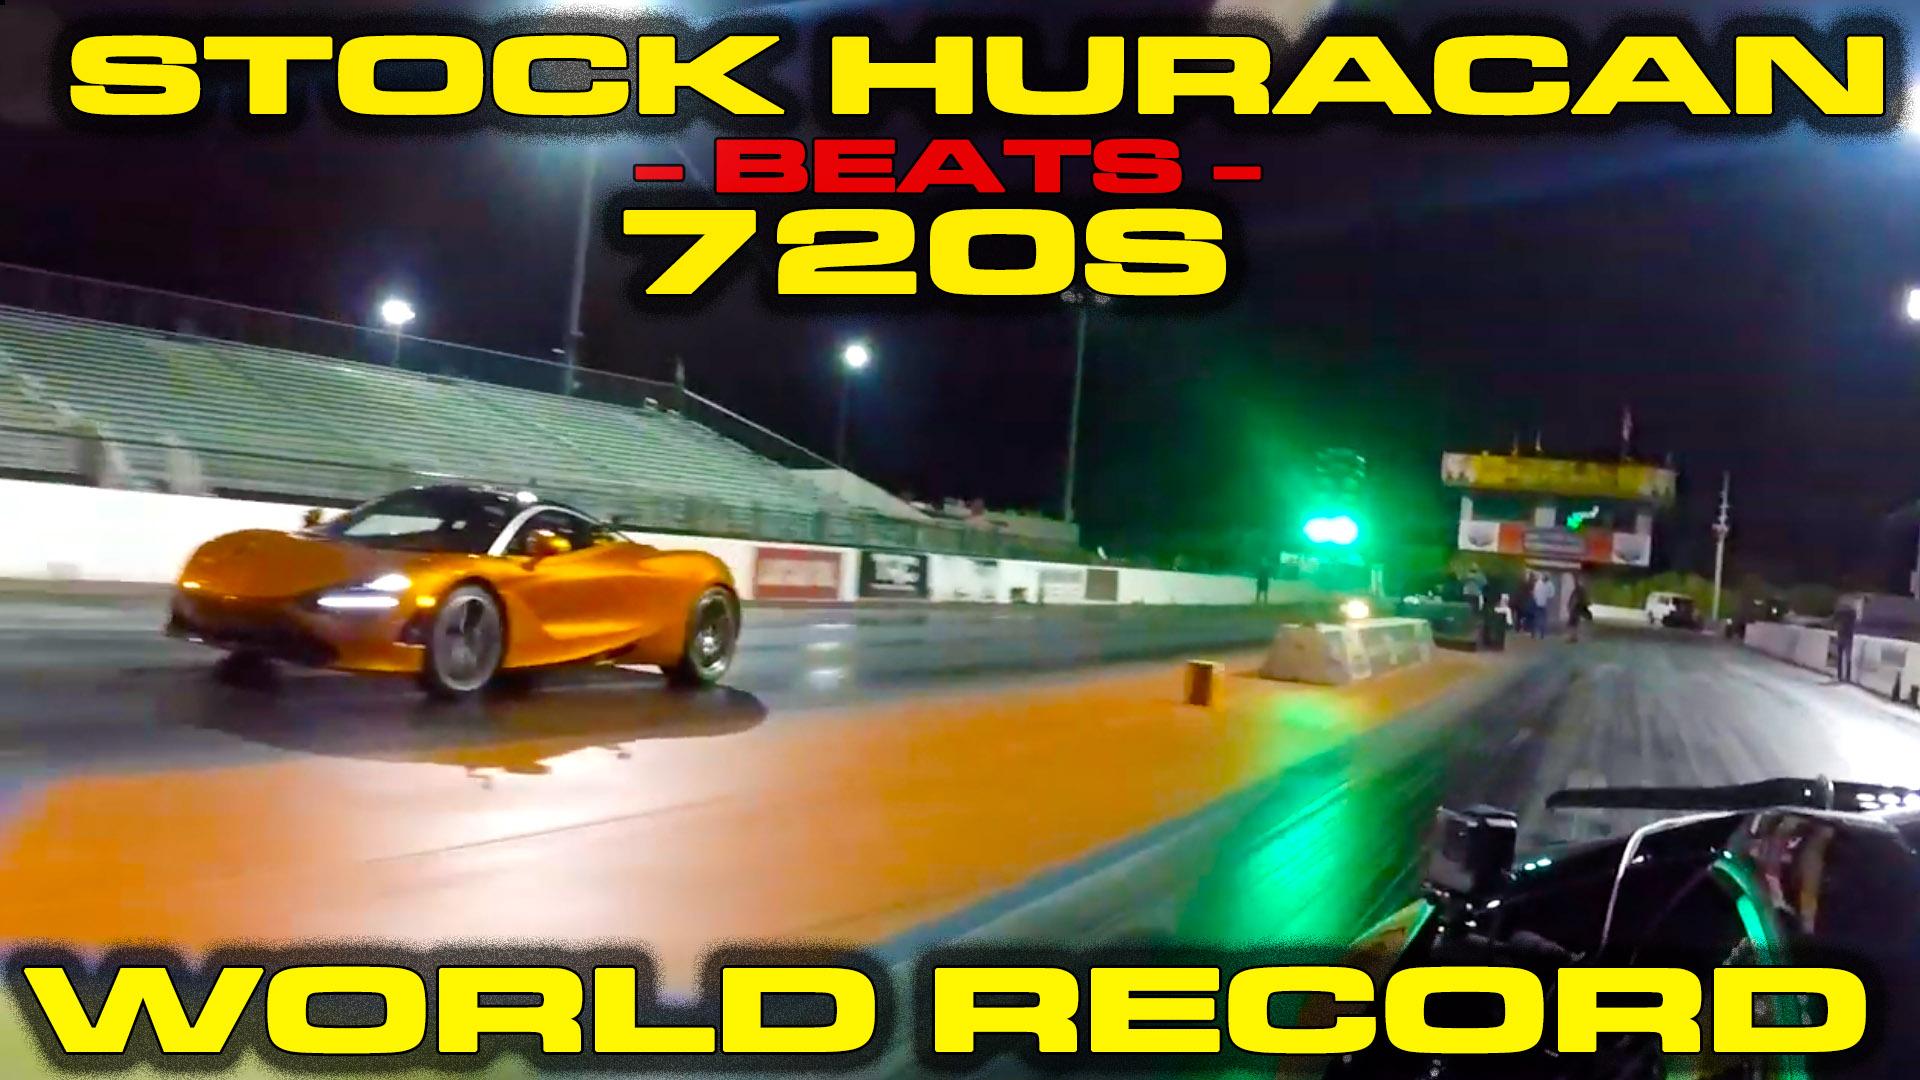 Huracan | DragTimes com Drag Racing, Fast Cars, Muscle Cars Blog